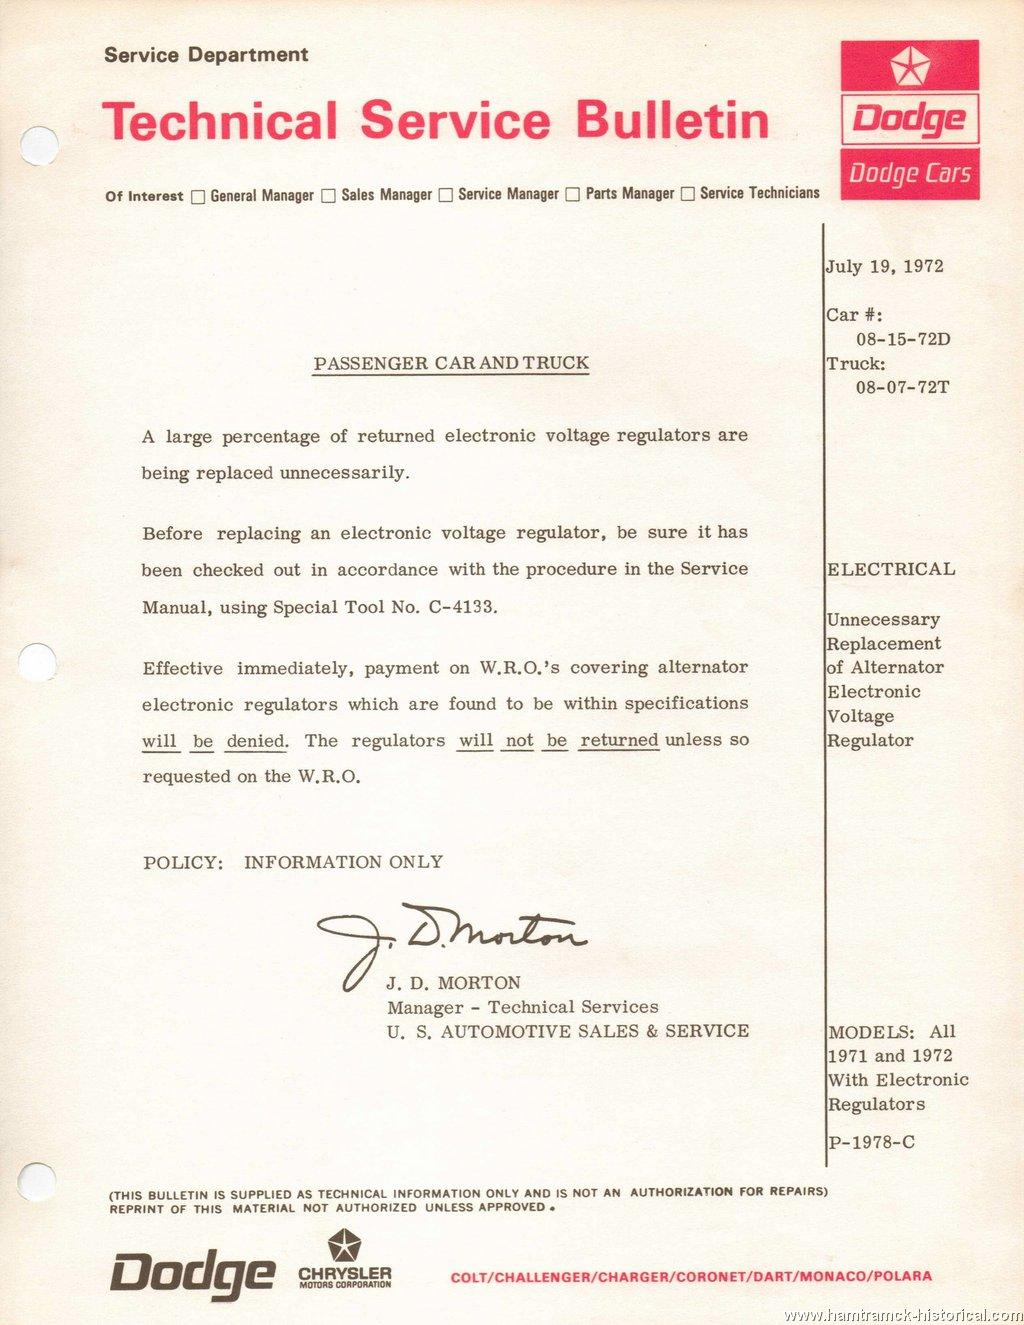 The 1970 Hamtramck Registry 1972 Dodge Tsbs Page Charger Alternator Wiring Regulator All Models With Electronic Regulators 1